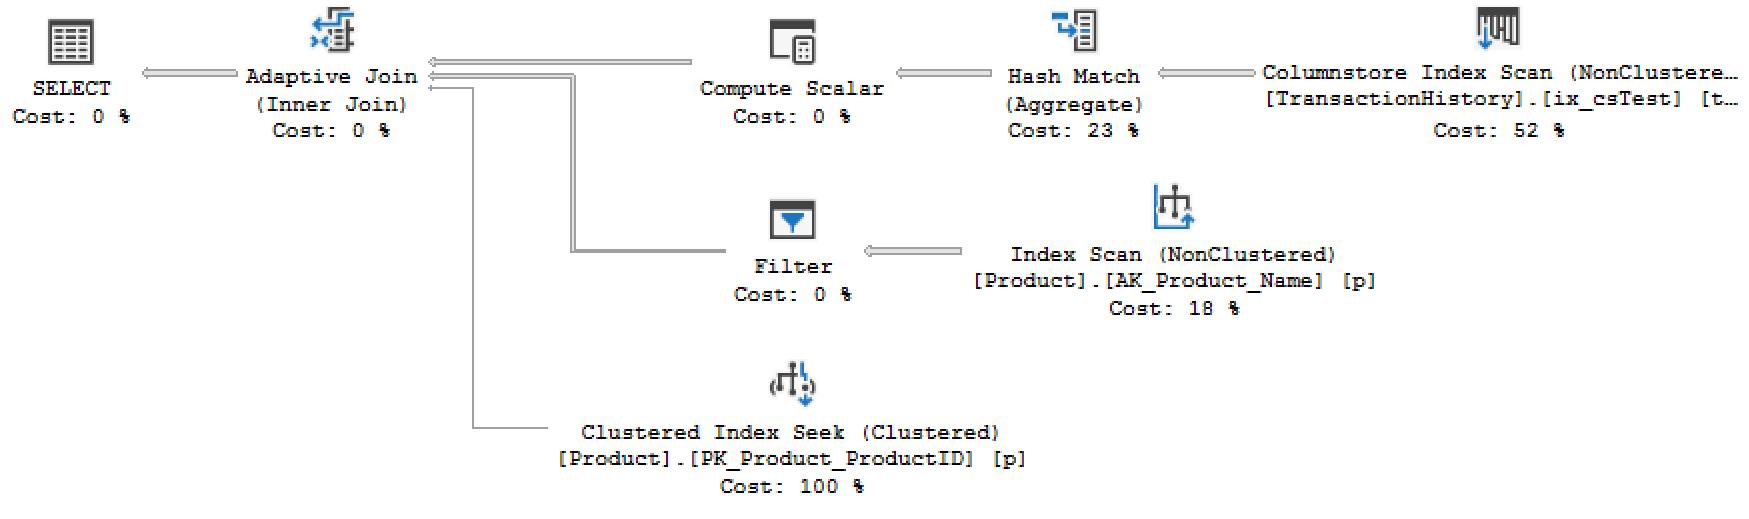 SQL cover image